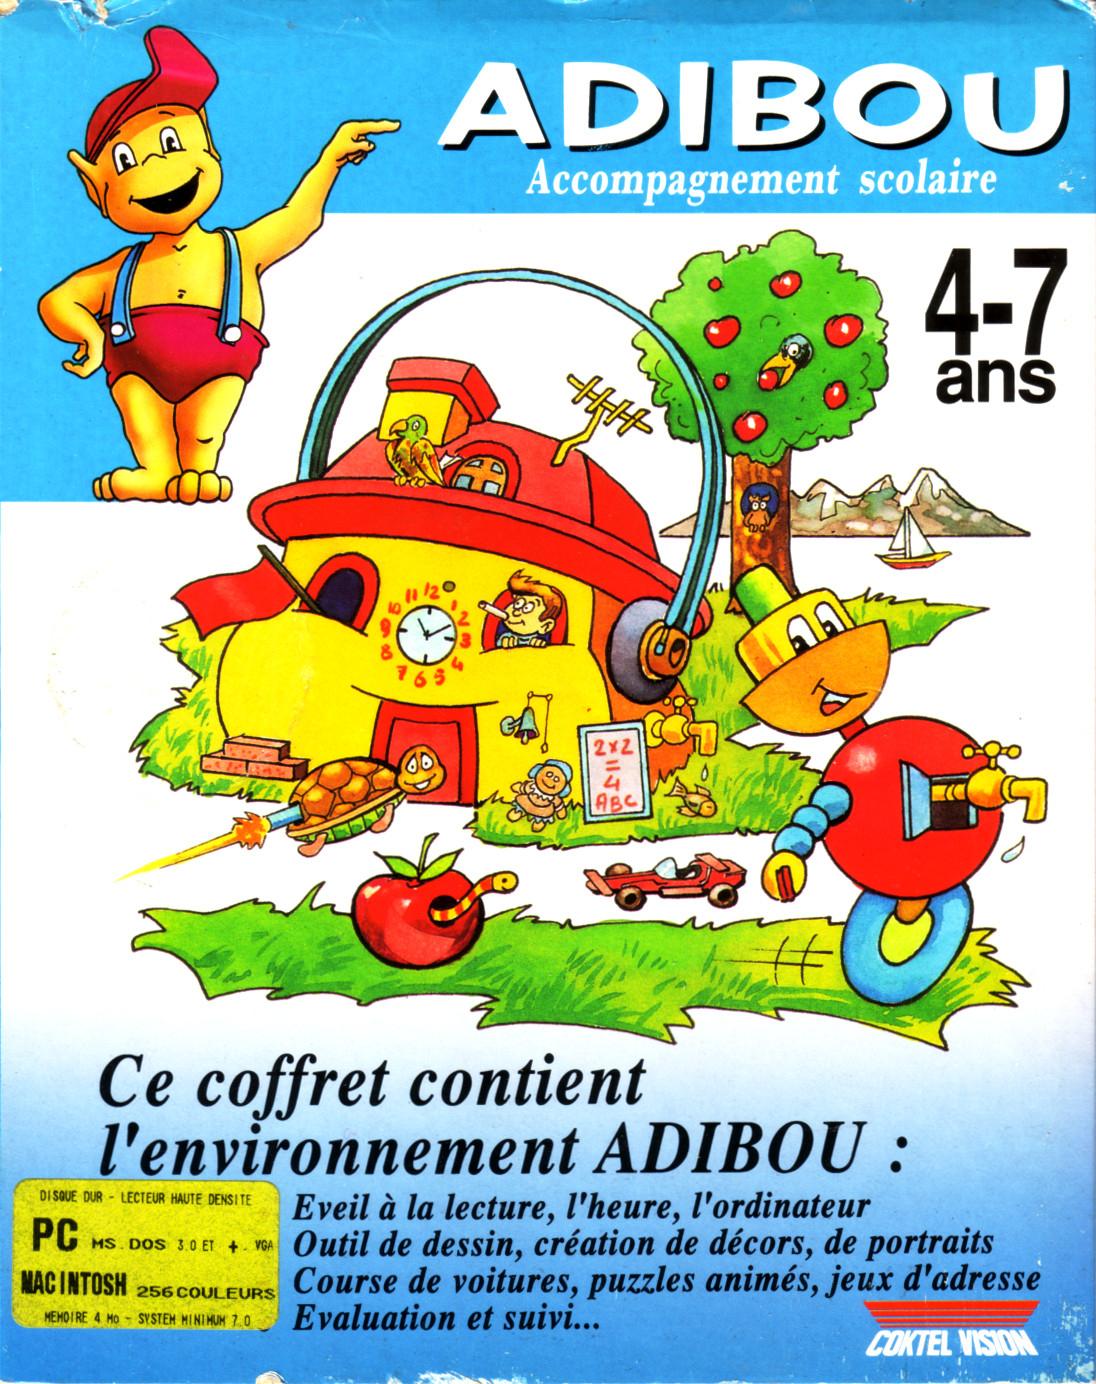 Ltf Abandonware France, Galeries D'images Du Jeu Adibou à Adibou Voiture